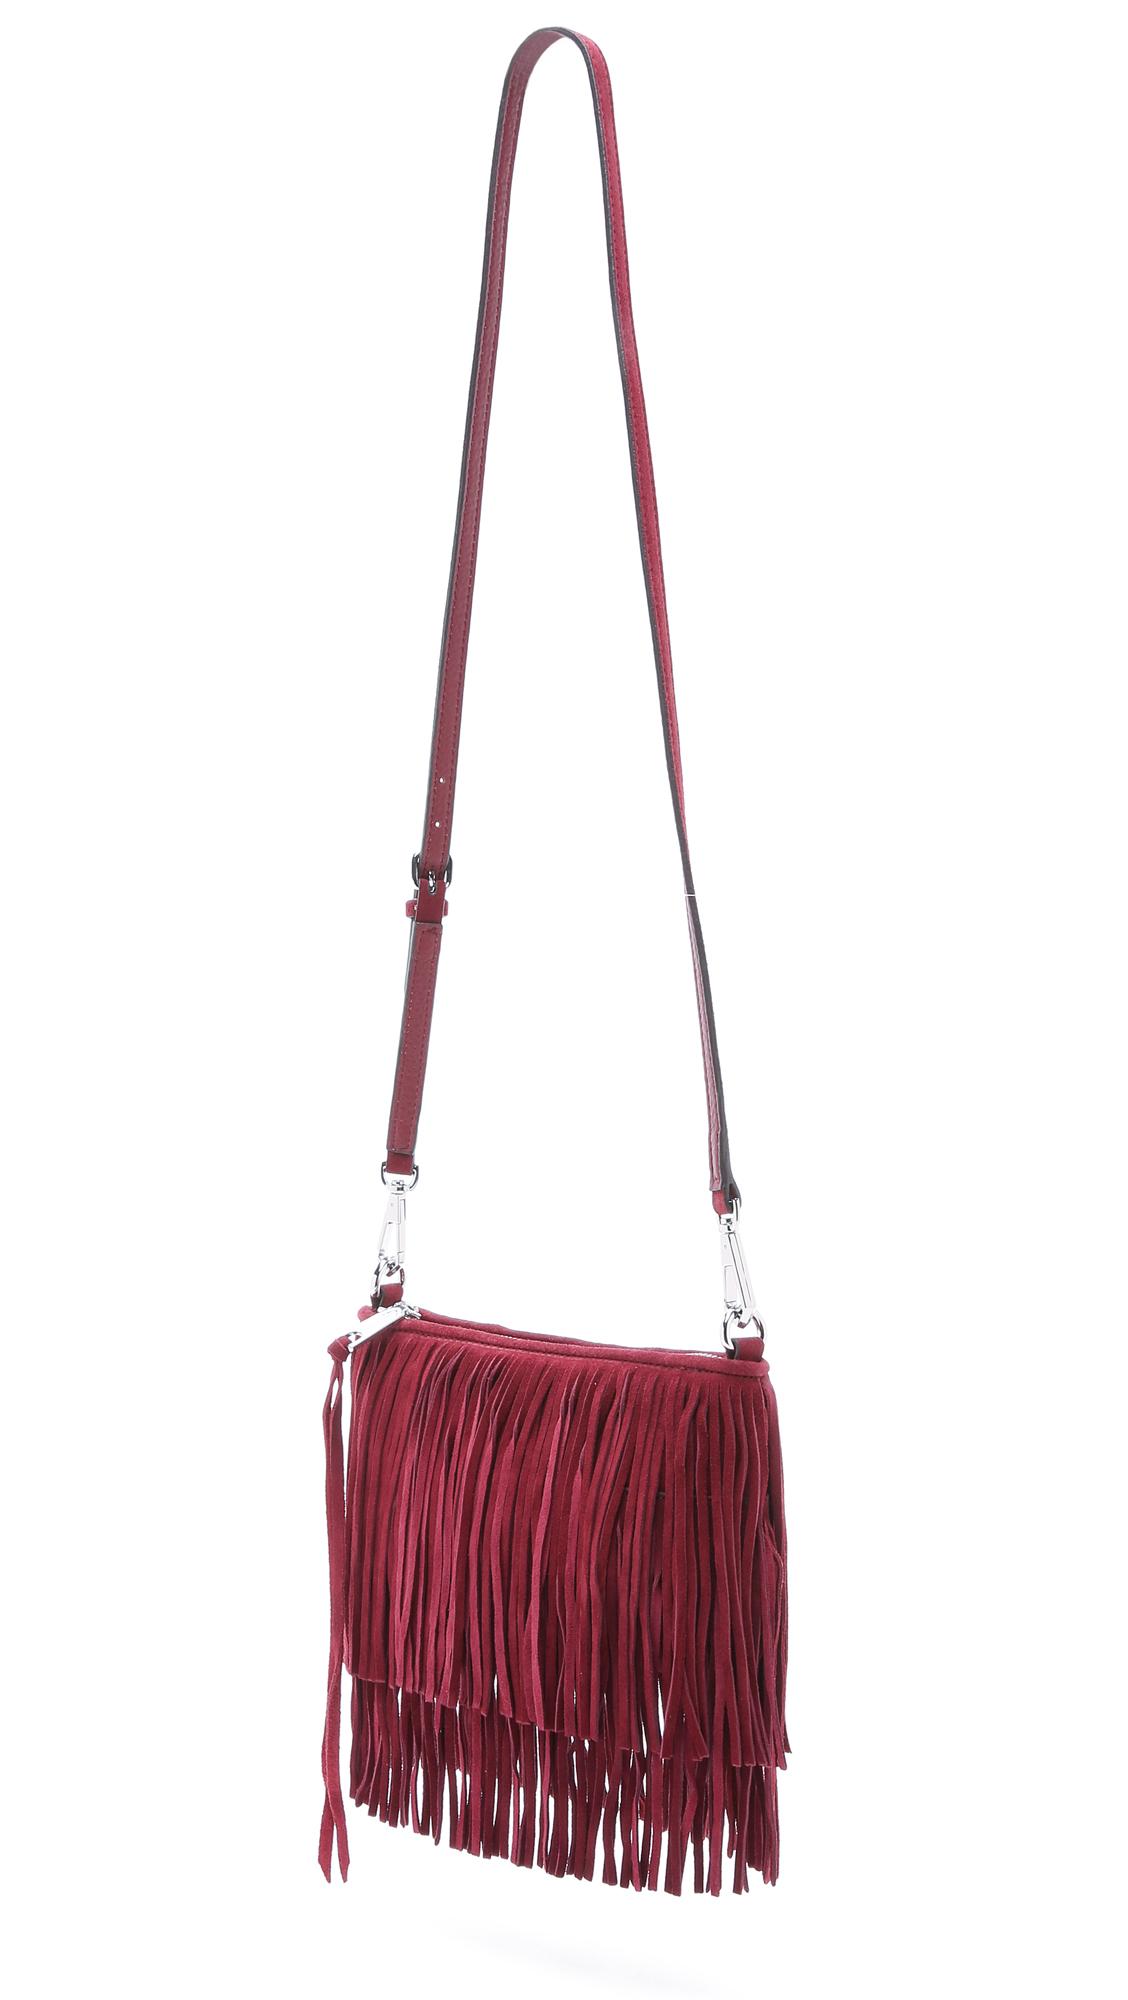 Rebecca Minkoff Finn Cross Body Bag - Port in Red